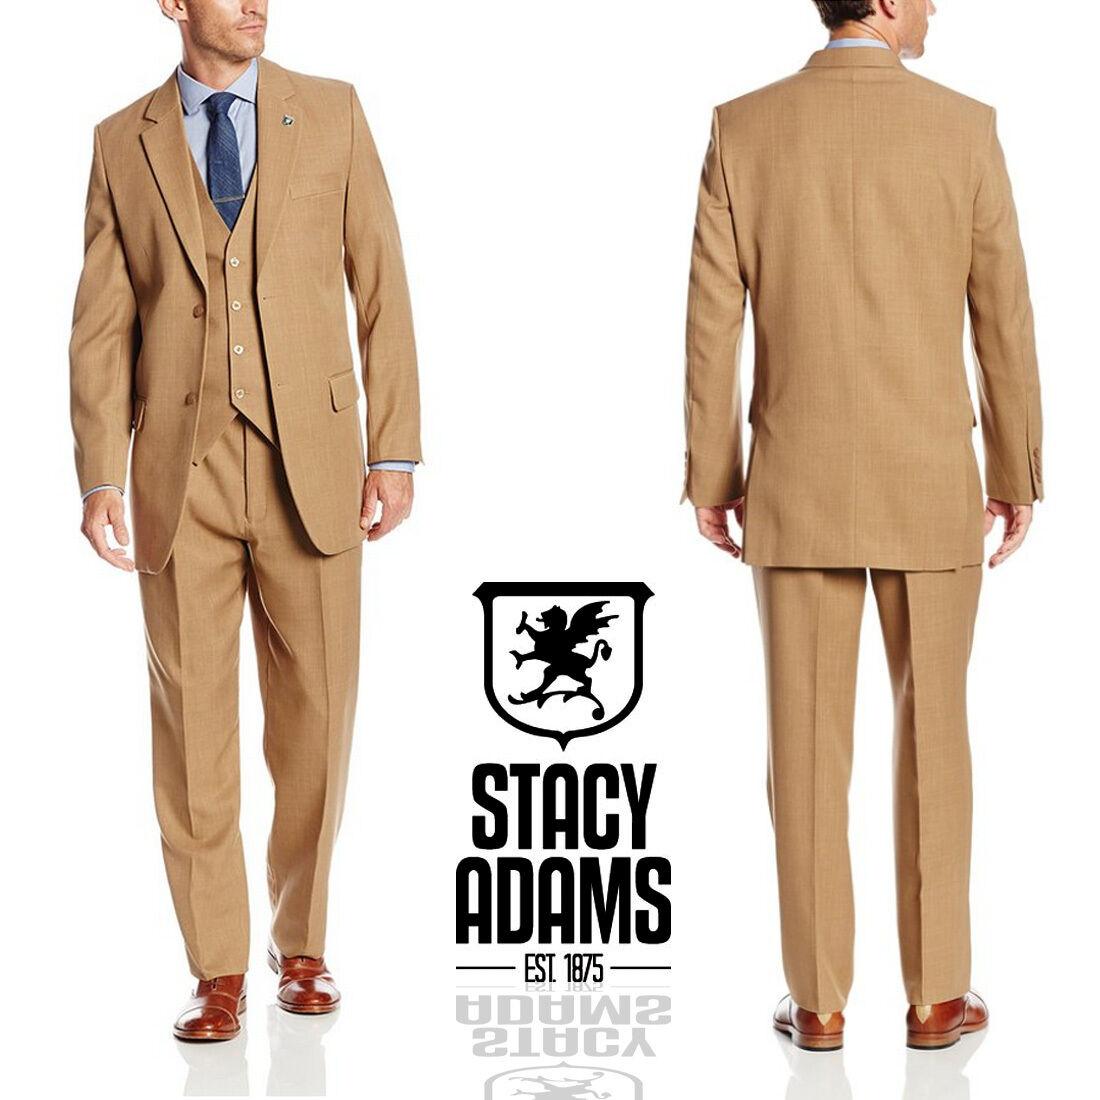 NWT LUXURY MEN'S SUIT BY STACY ADAMS 4016-448 REGULAR OR LARGE 3PC SET REG.r